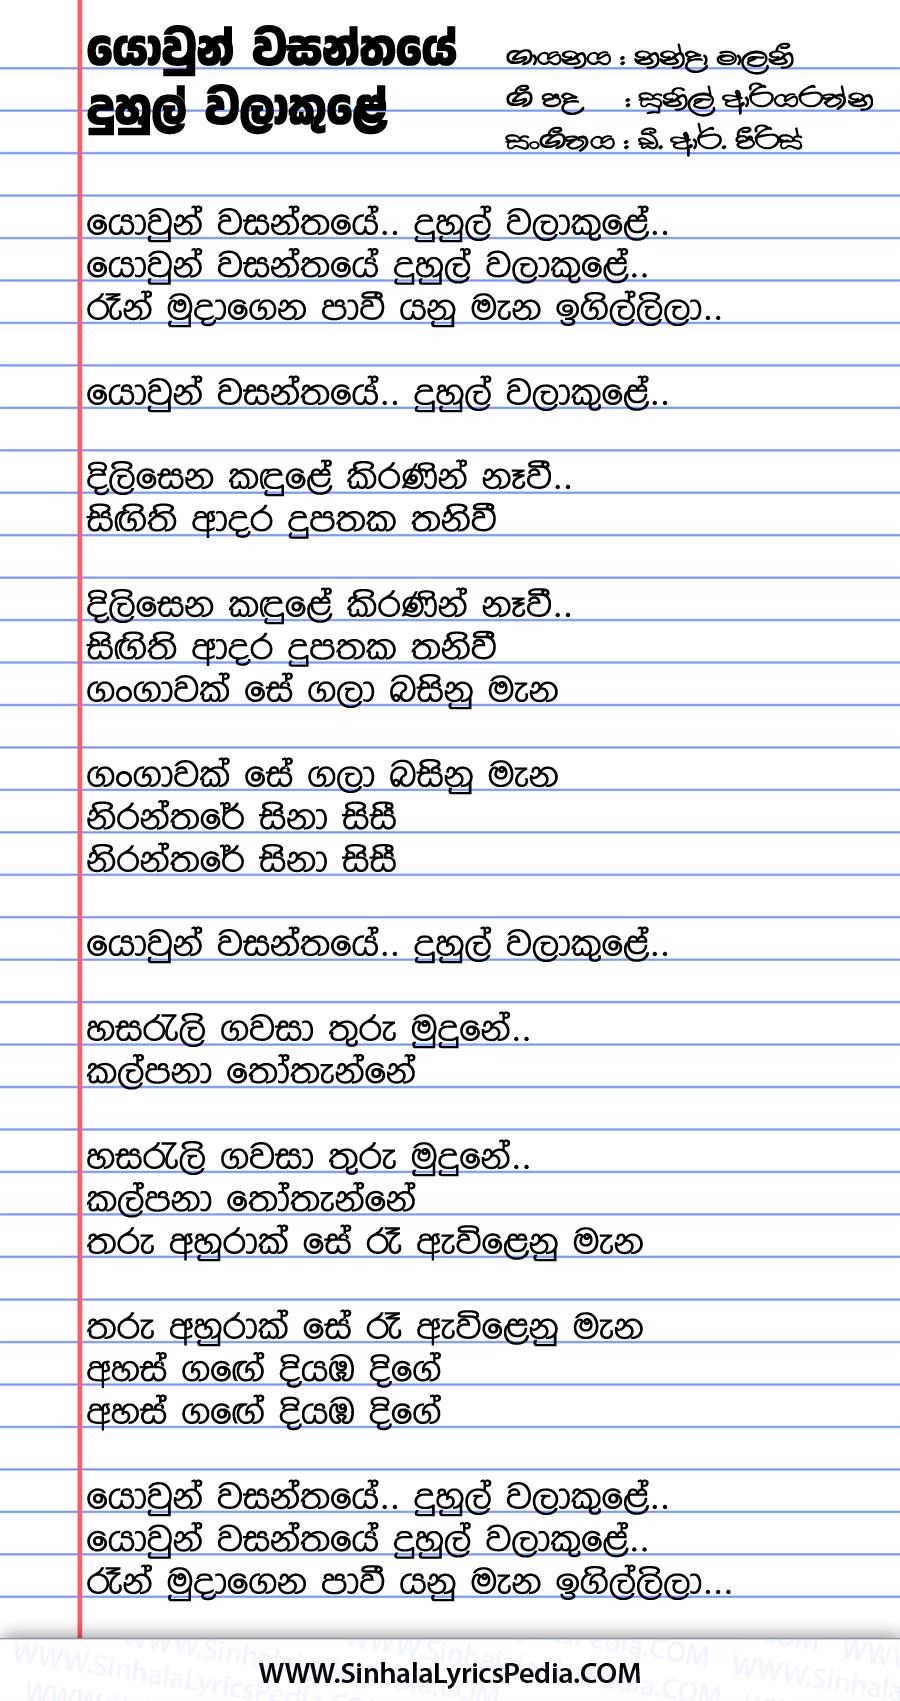 Yowun Wasanthaye Duhul Walakule Song Lyrics